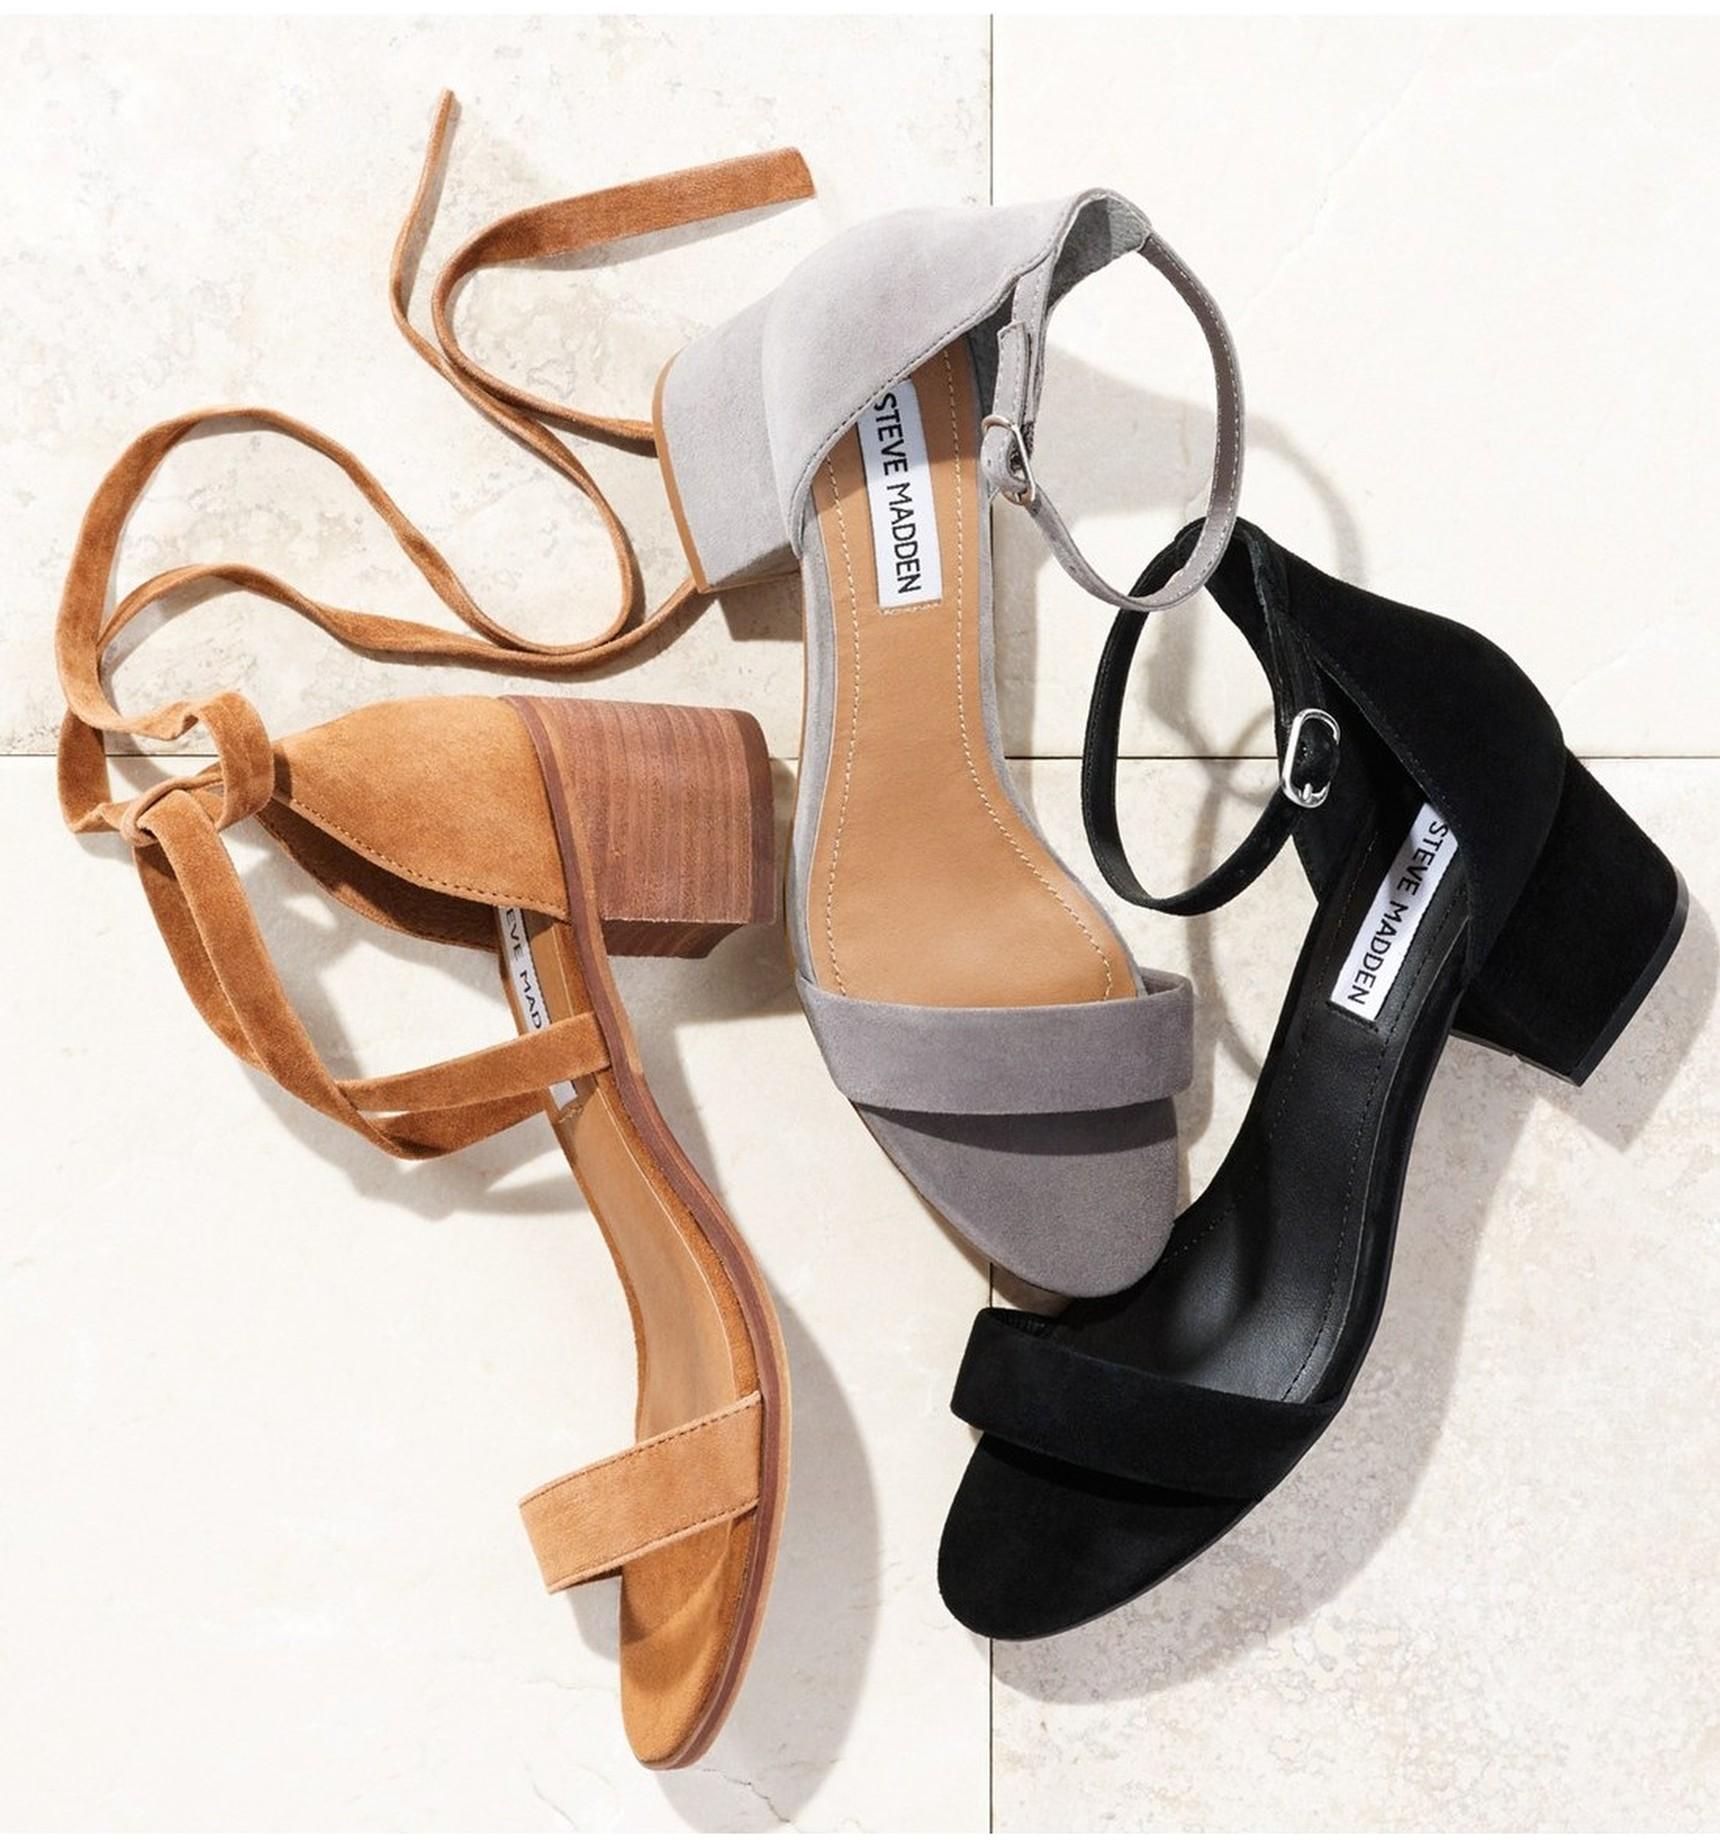 4 Sandal and Pedicure Polish Pairings to Try Now via. www.birdieshoots.com